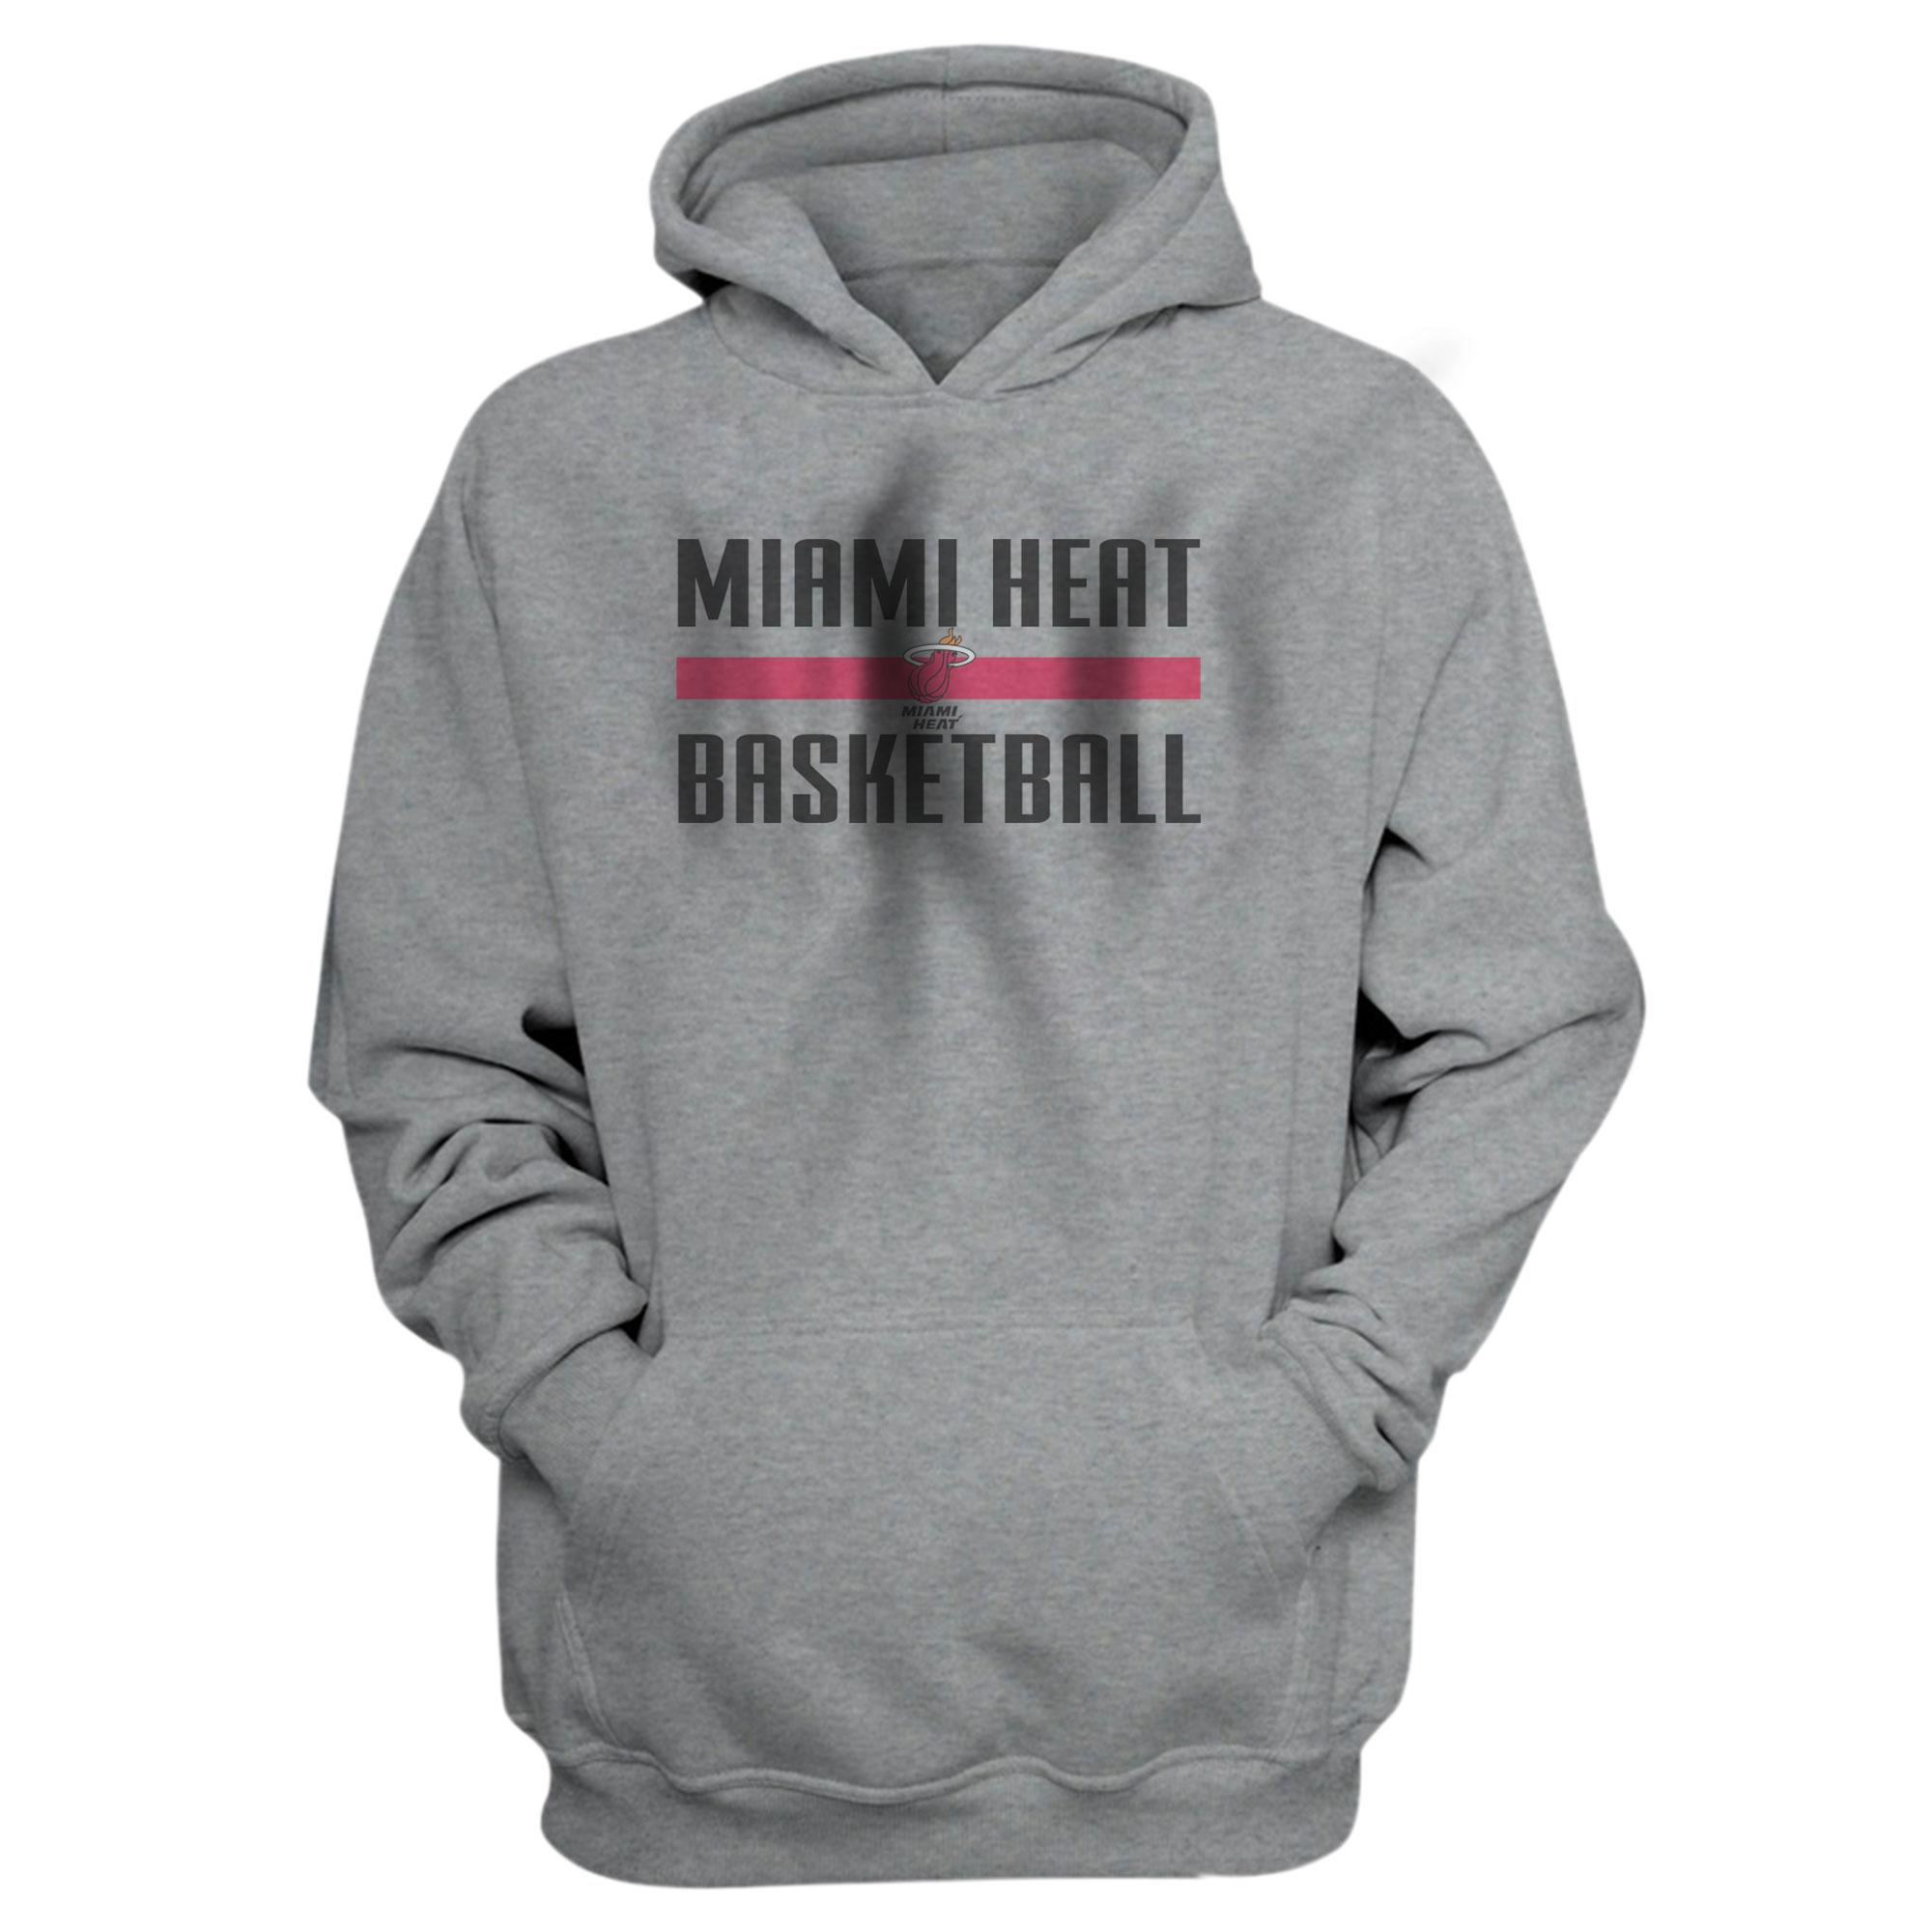 Miami Heat Basketball Hoodie  (HD-GRY-NP-miami-bsktbll-528)